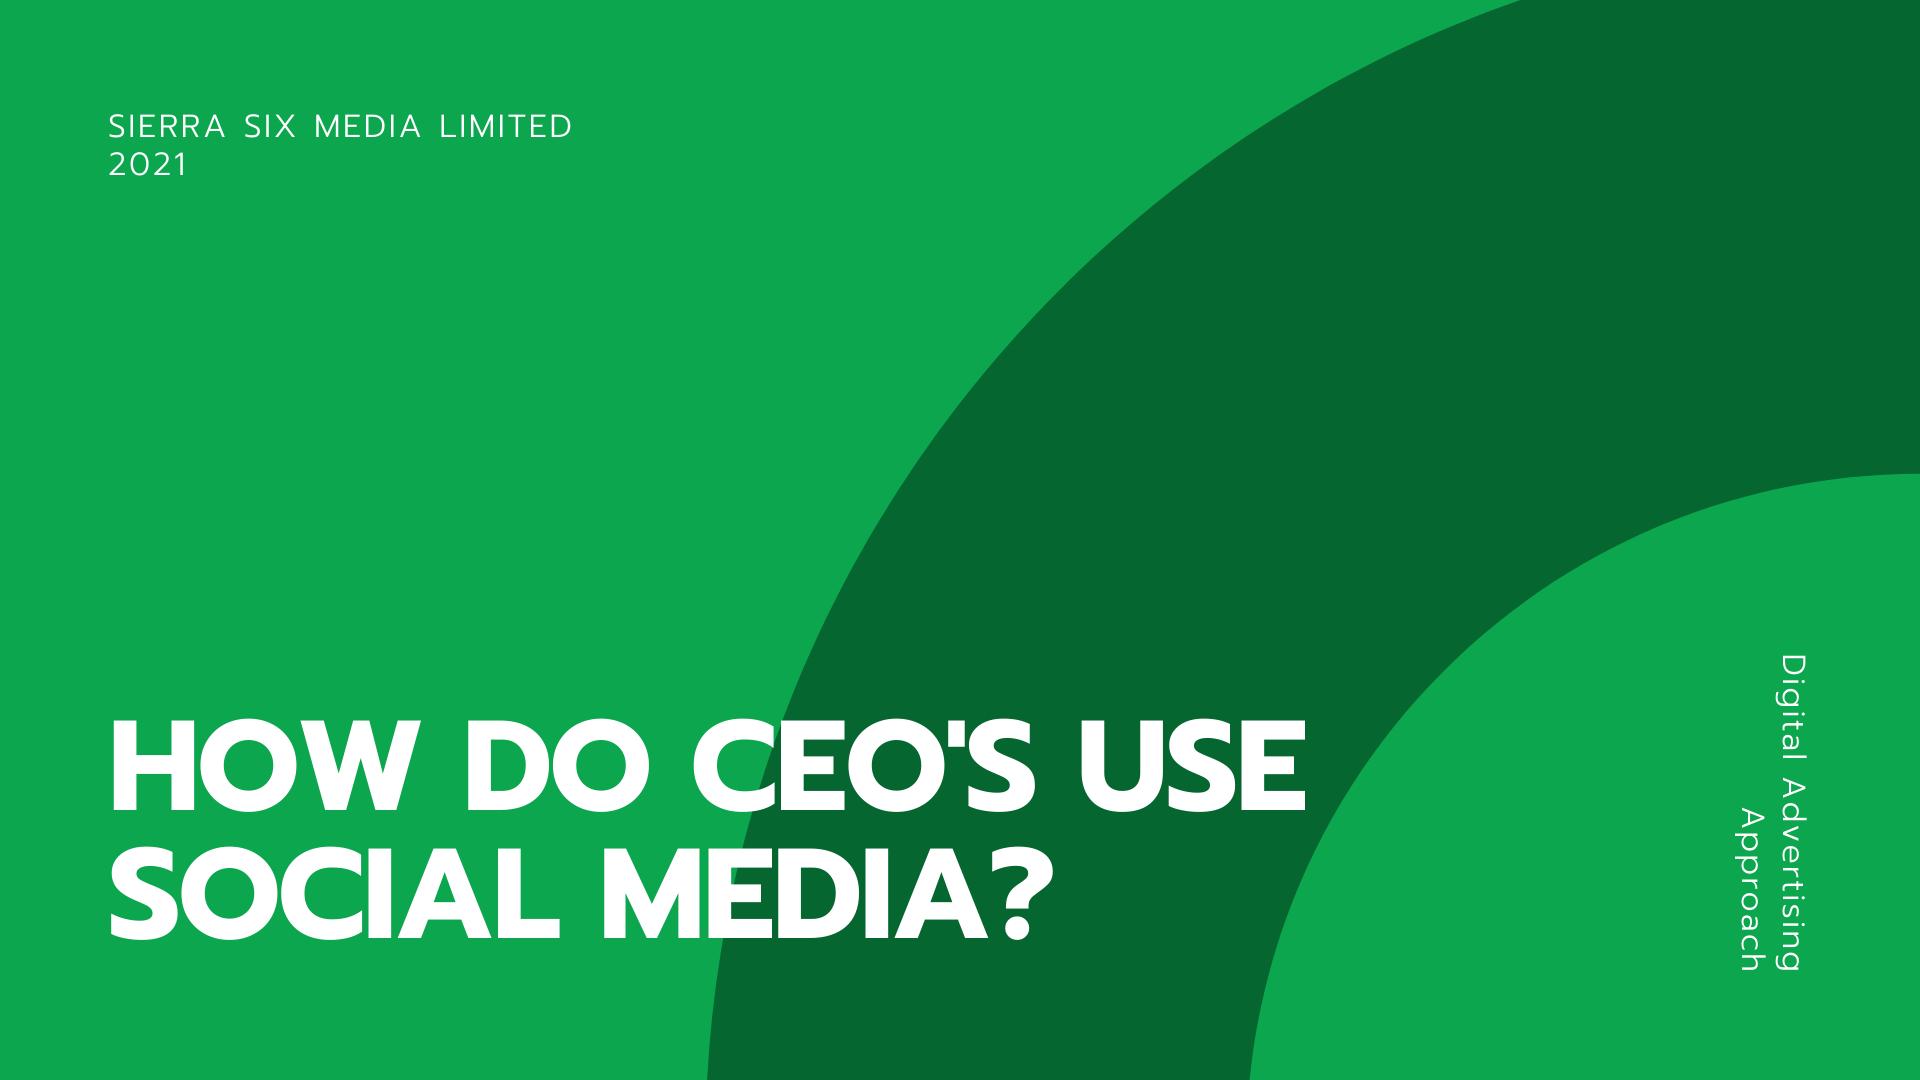 Sierra Six Media, Digital marketing agency whitepaper: how CEO's use social media